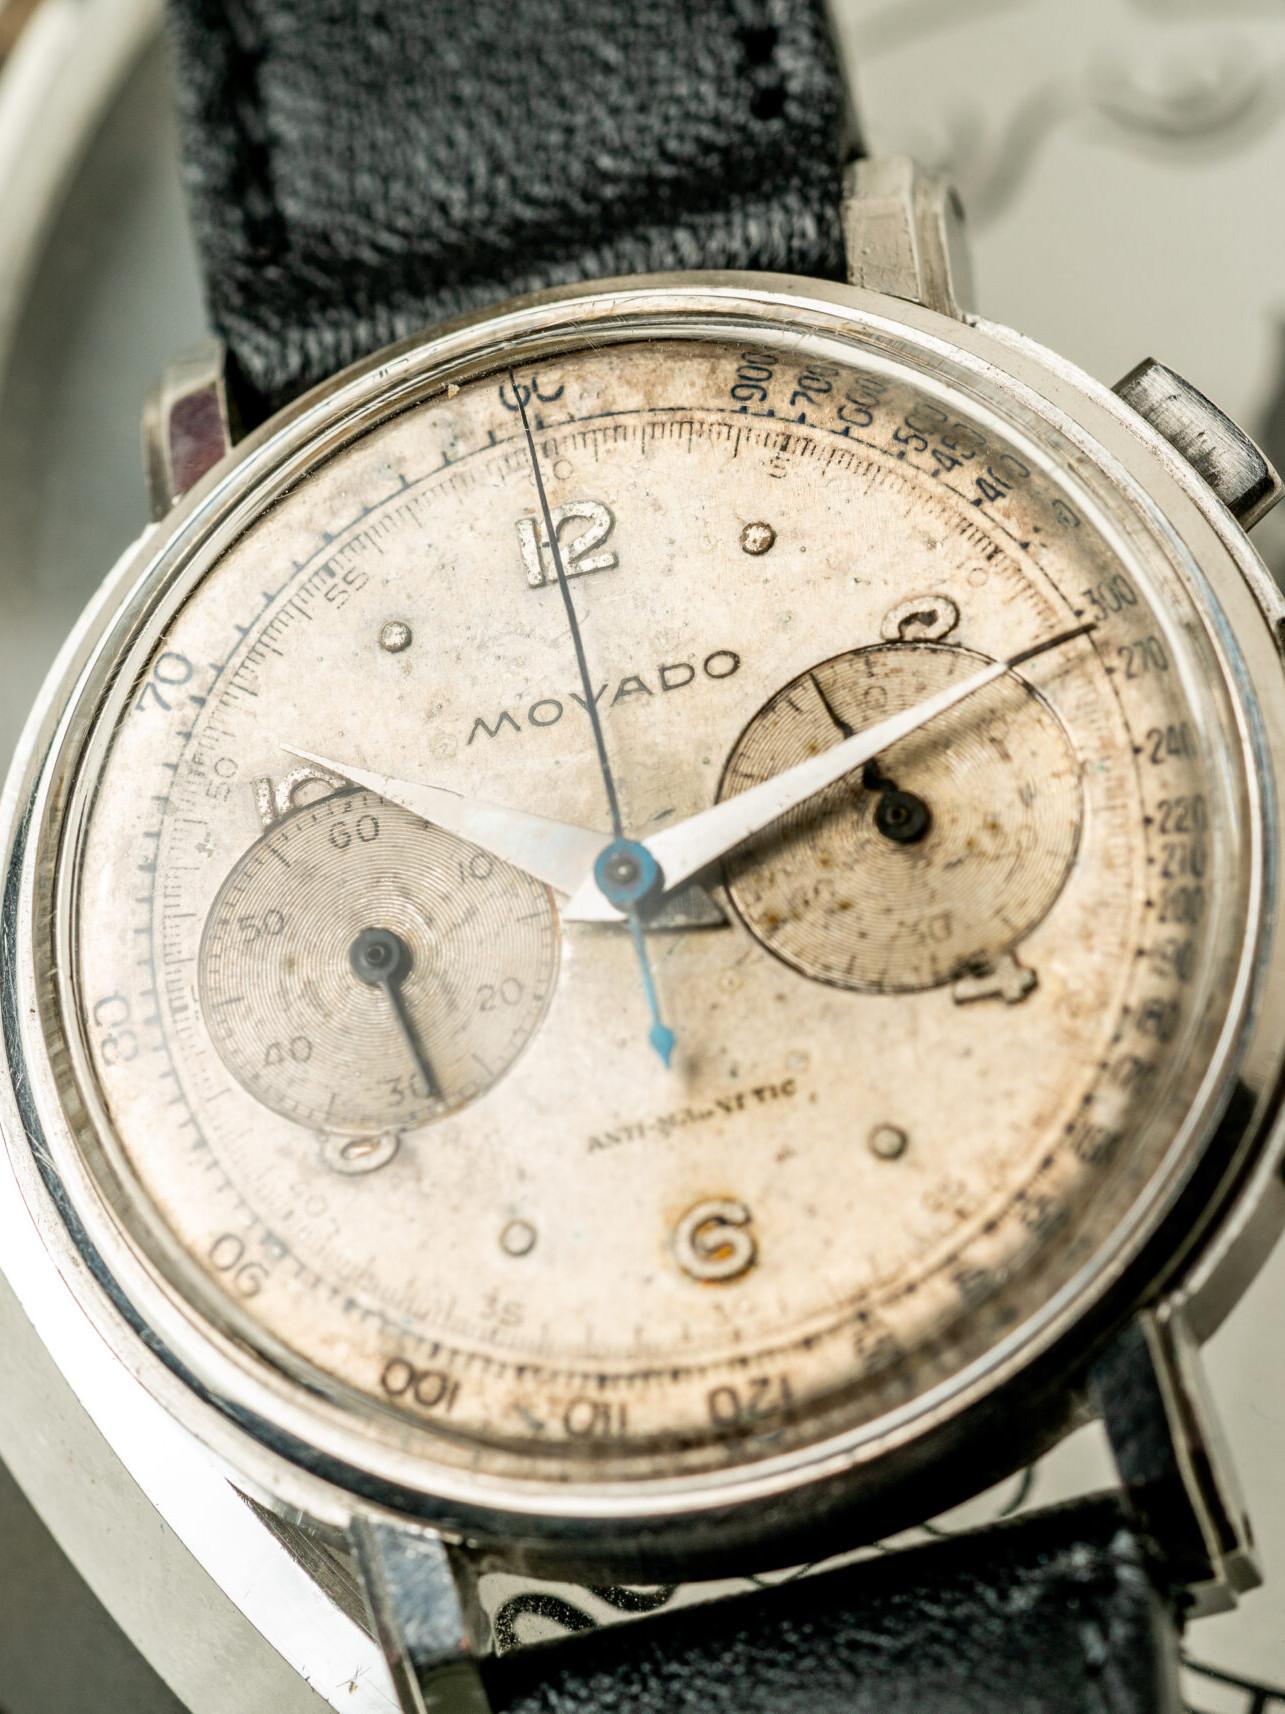 Movado chronograaf 19023 horloge jaren 40